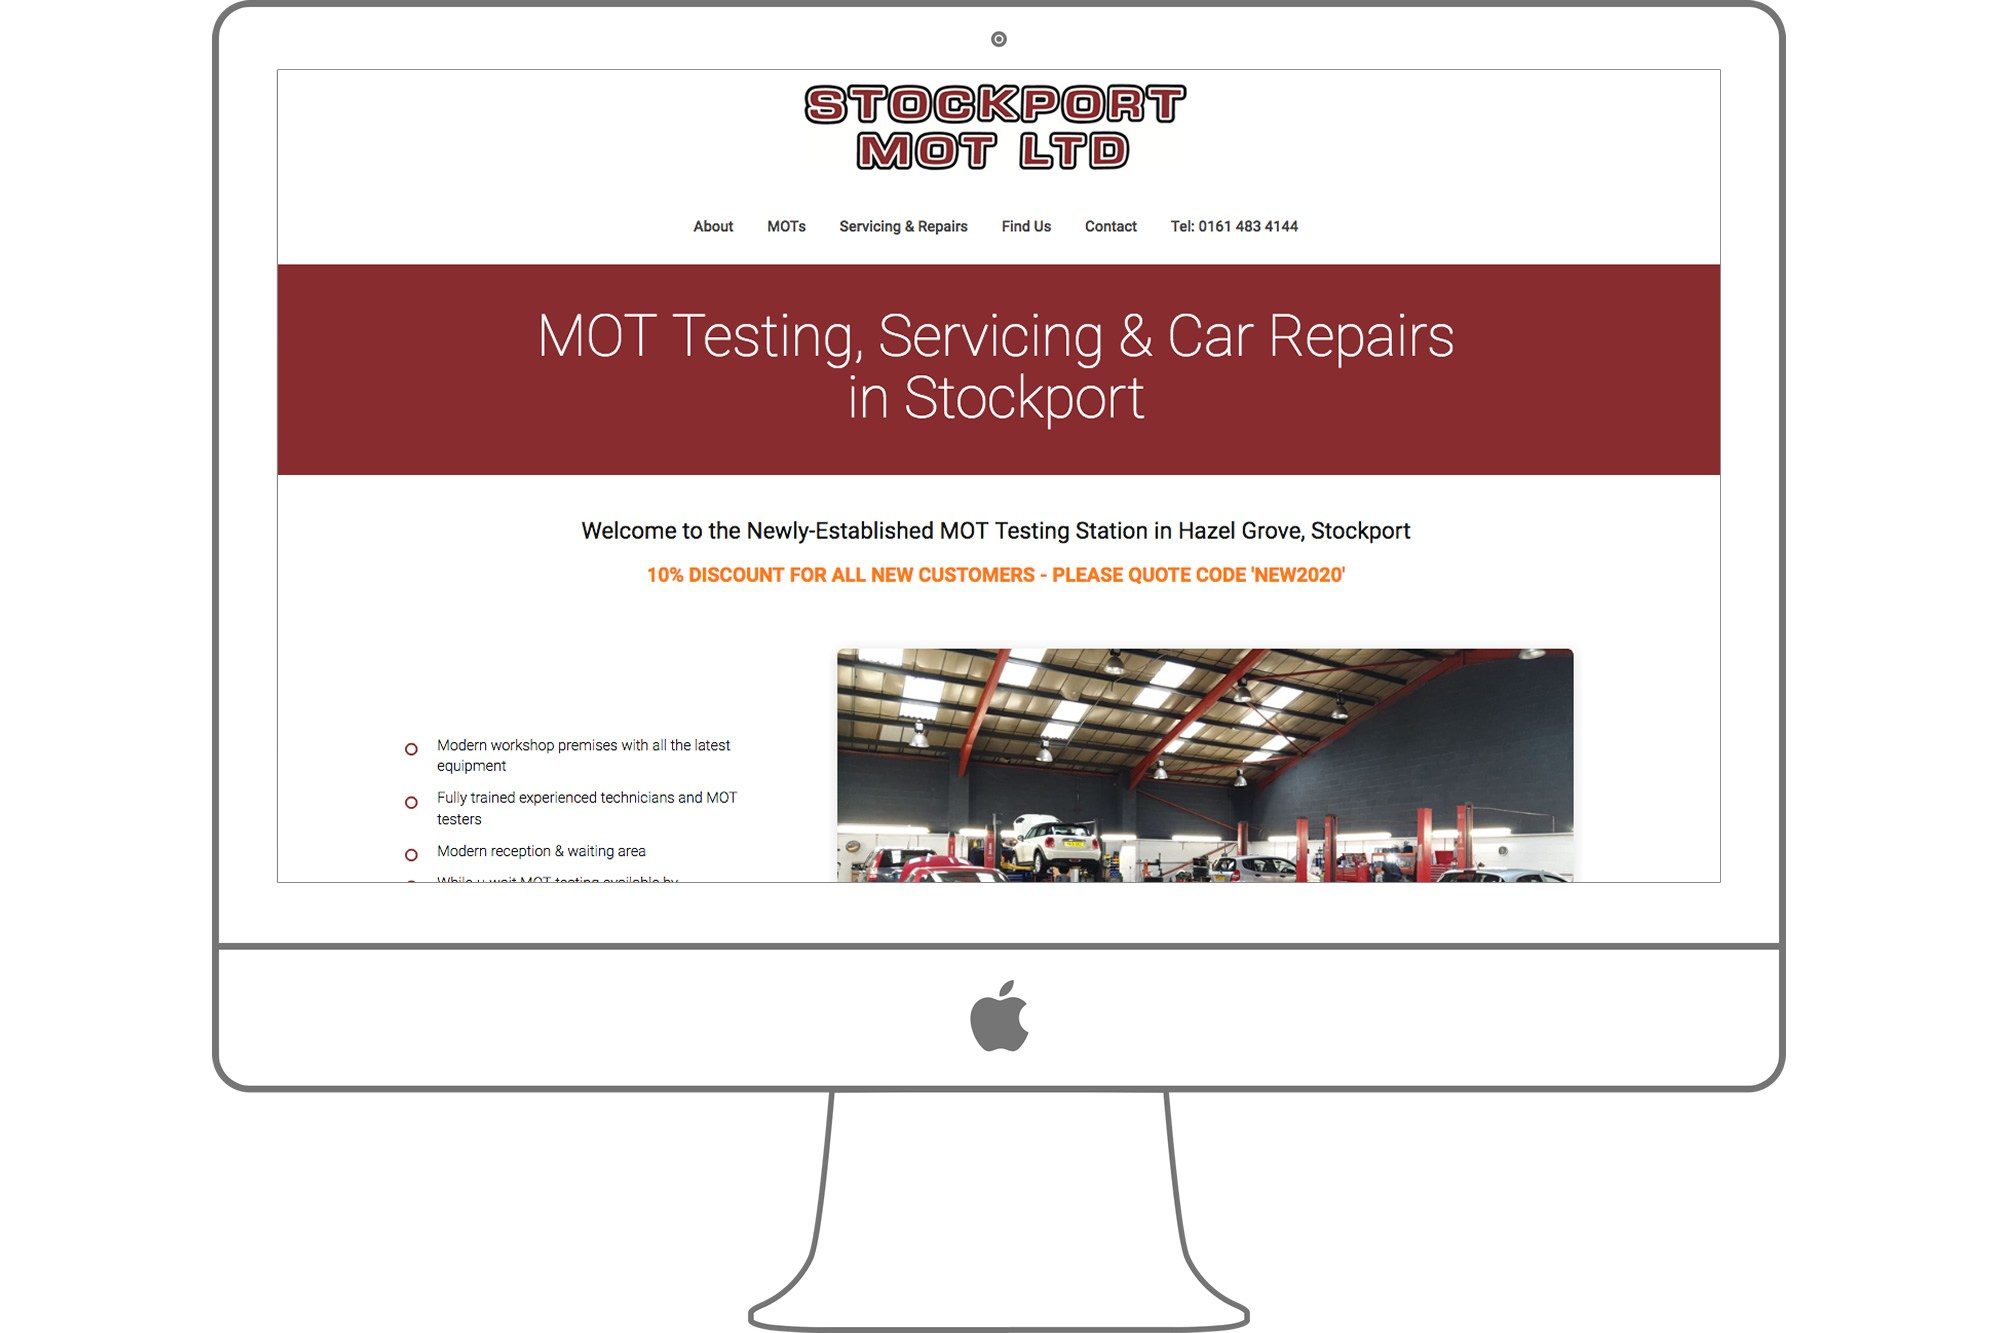 Stockport MOT Ltd